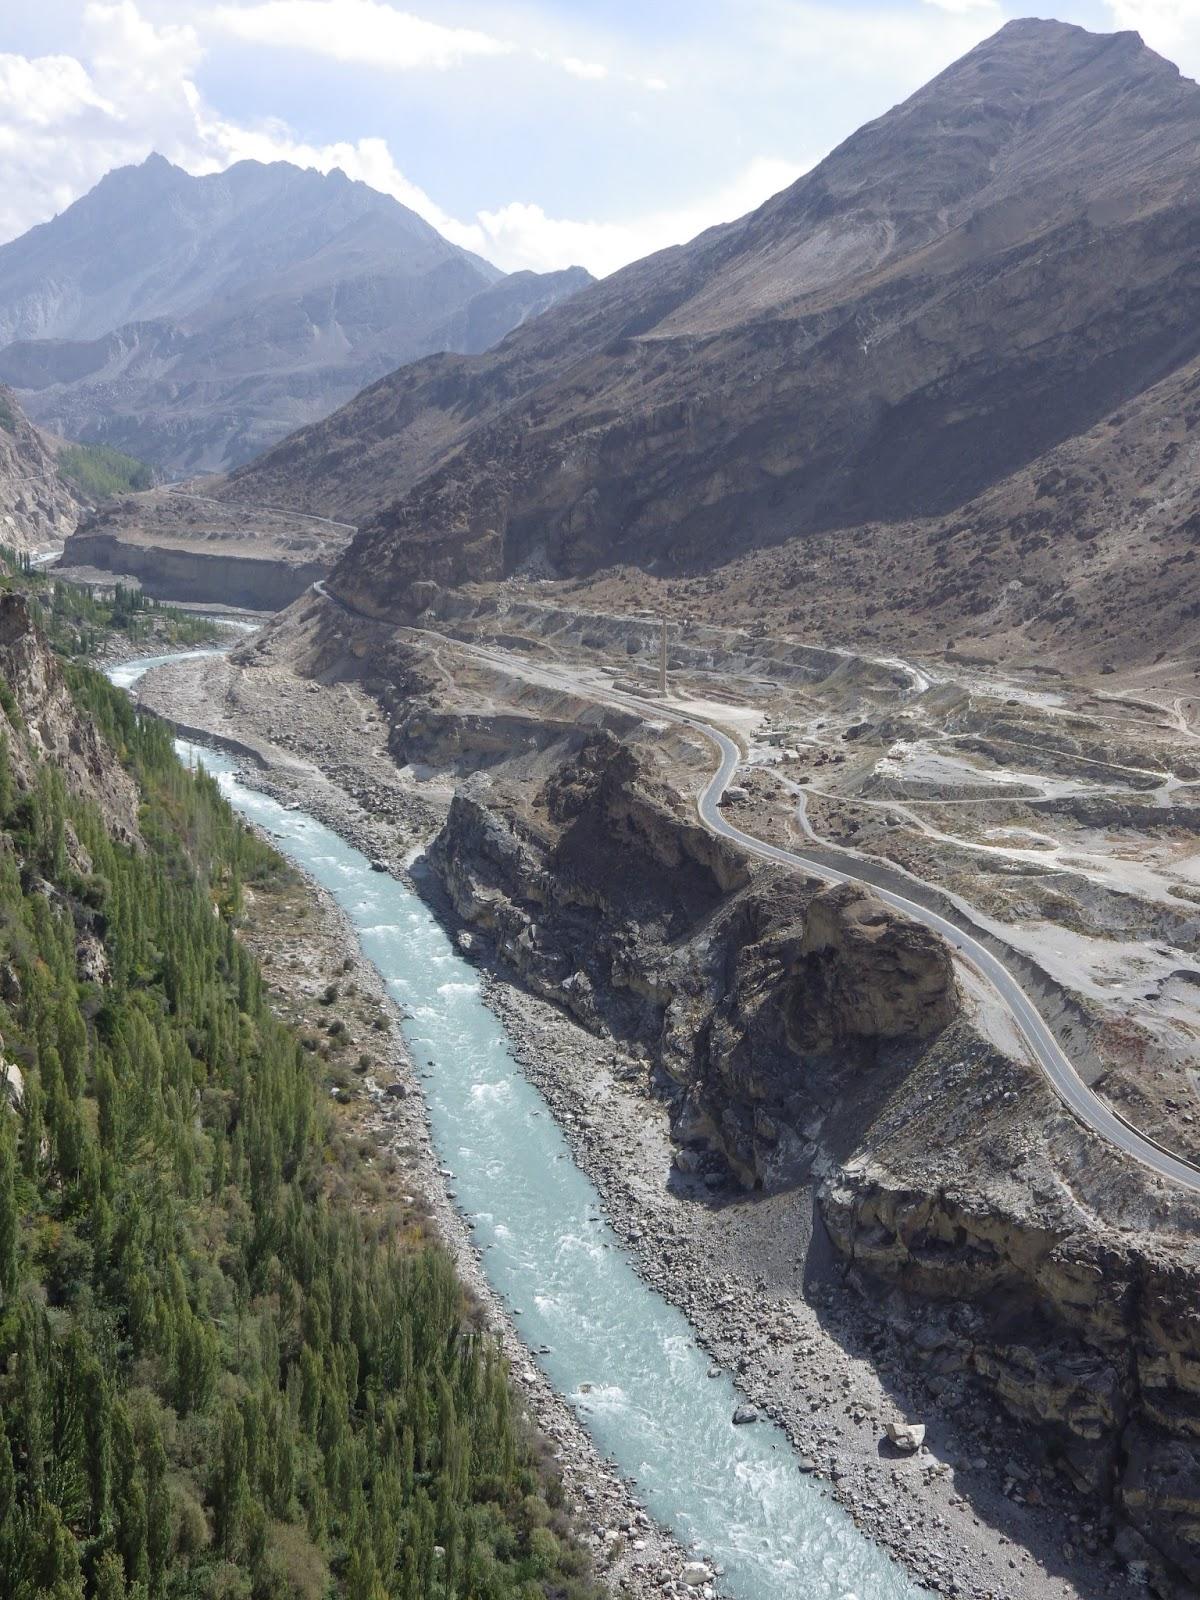 Karakoram Highway Pakistan to China Karakoram Highway Pakistan to China new picture